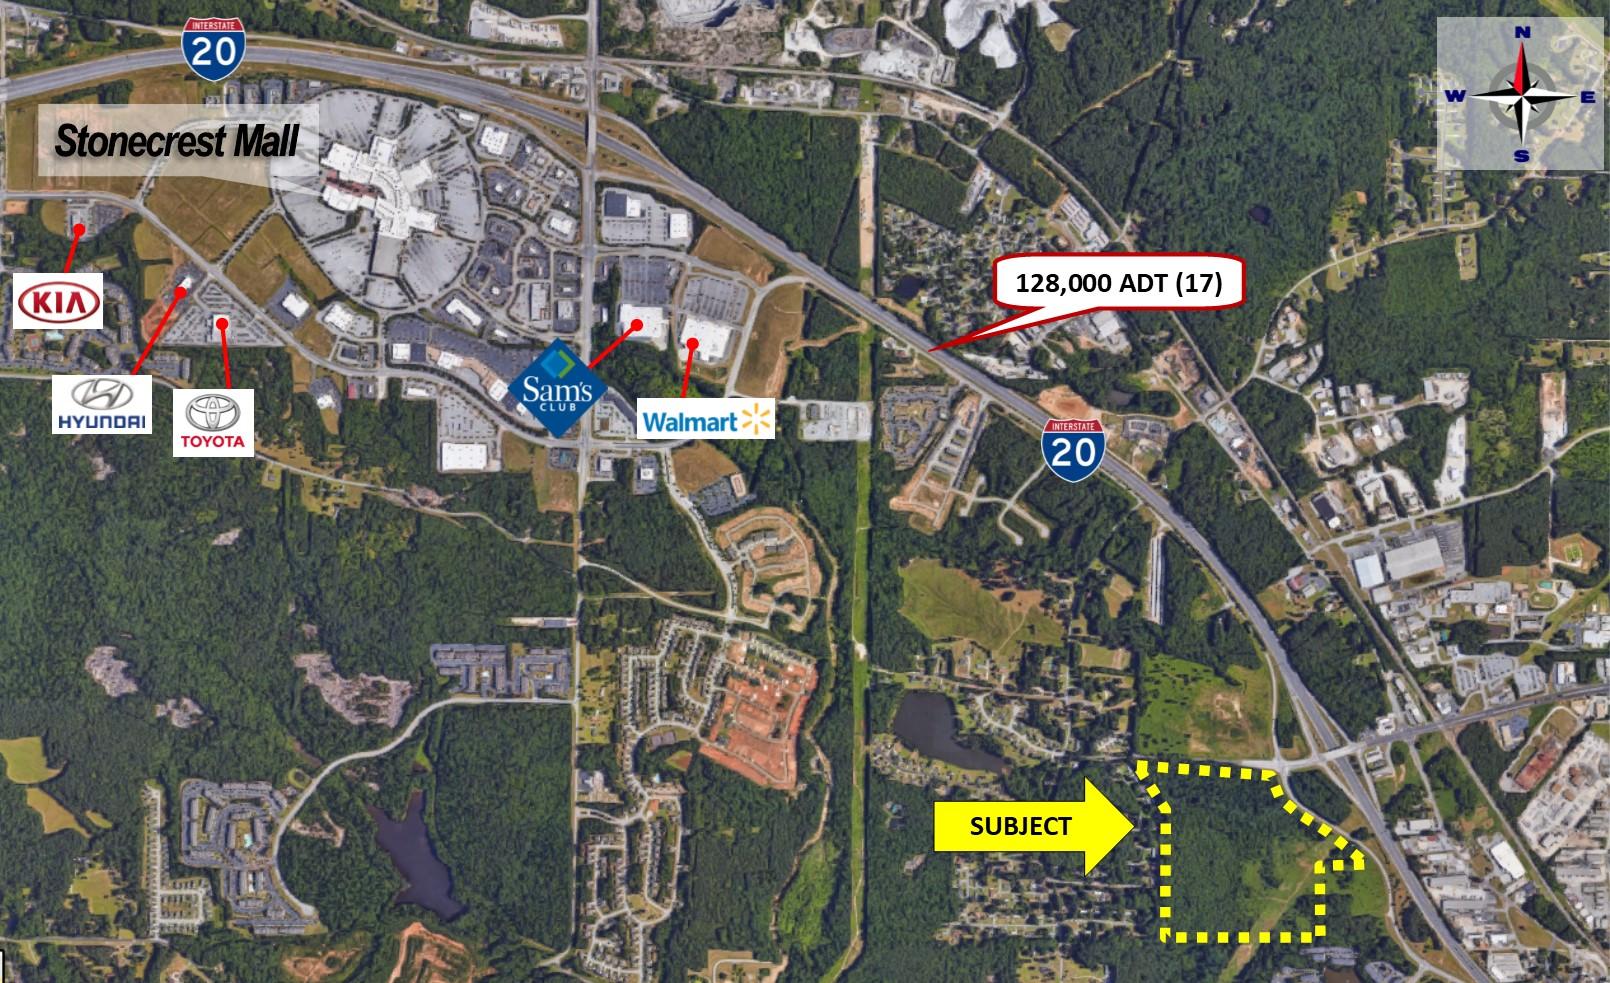 65 Acre Submarket Aerial.jpg